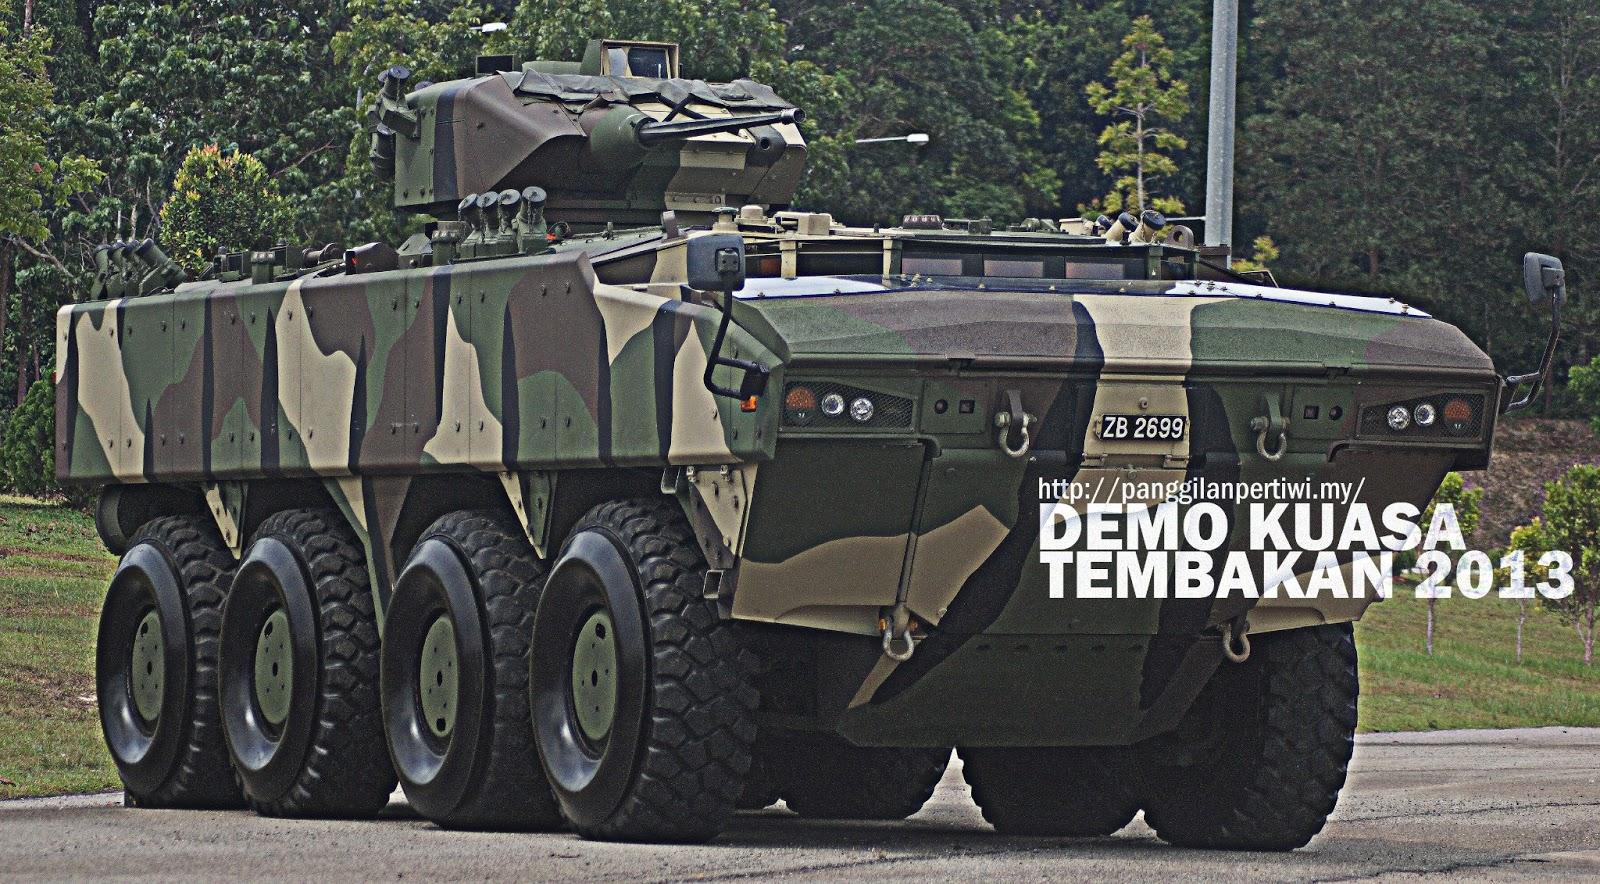 Mmp Hadir Ke Demo Kuasa Tembakan 2013 Malaysia Military